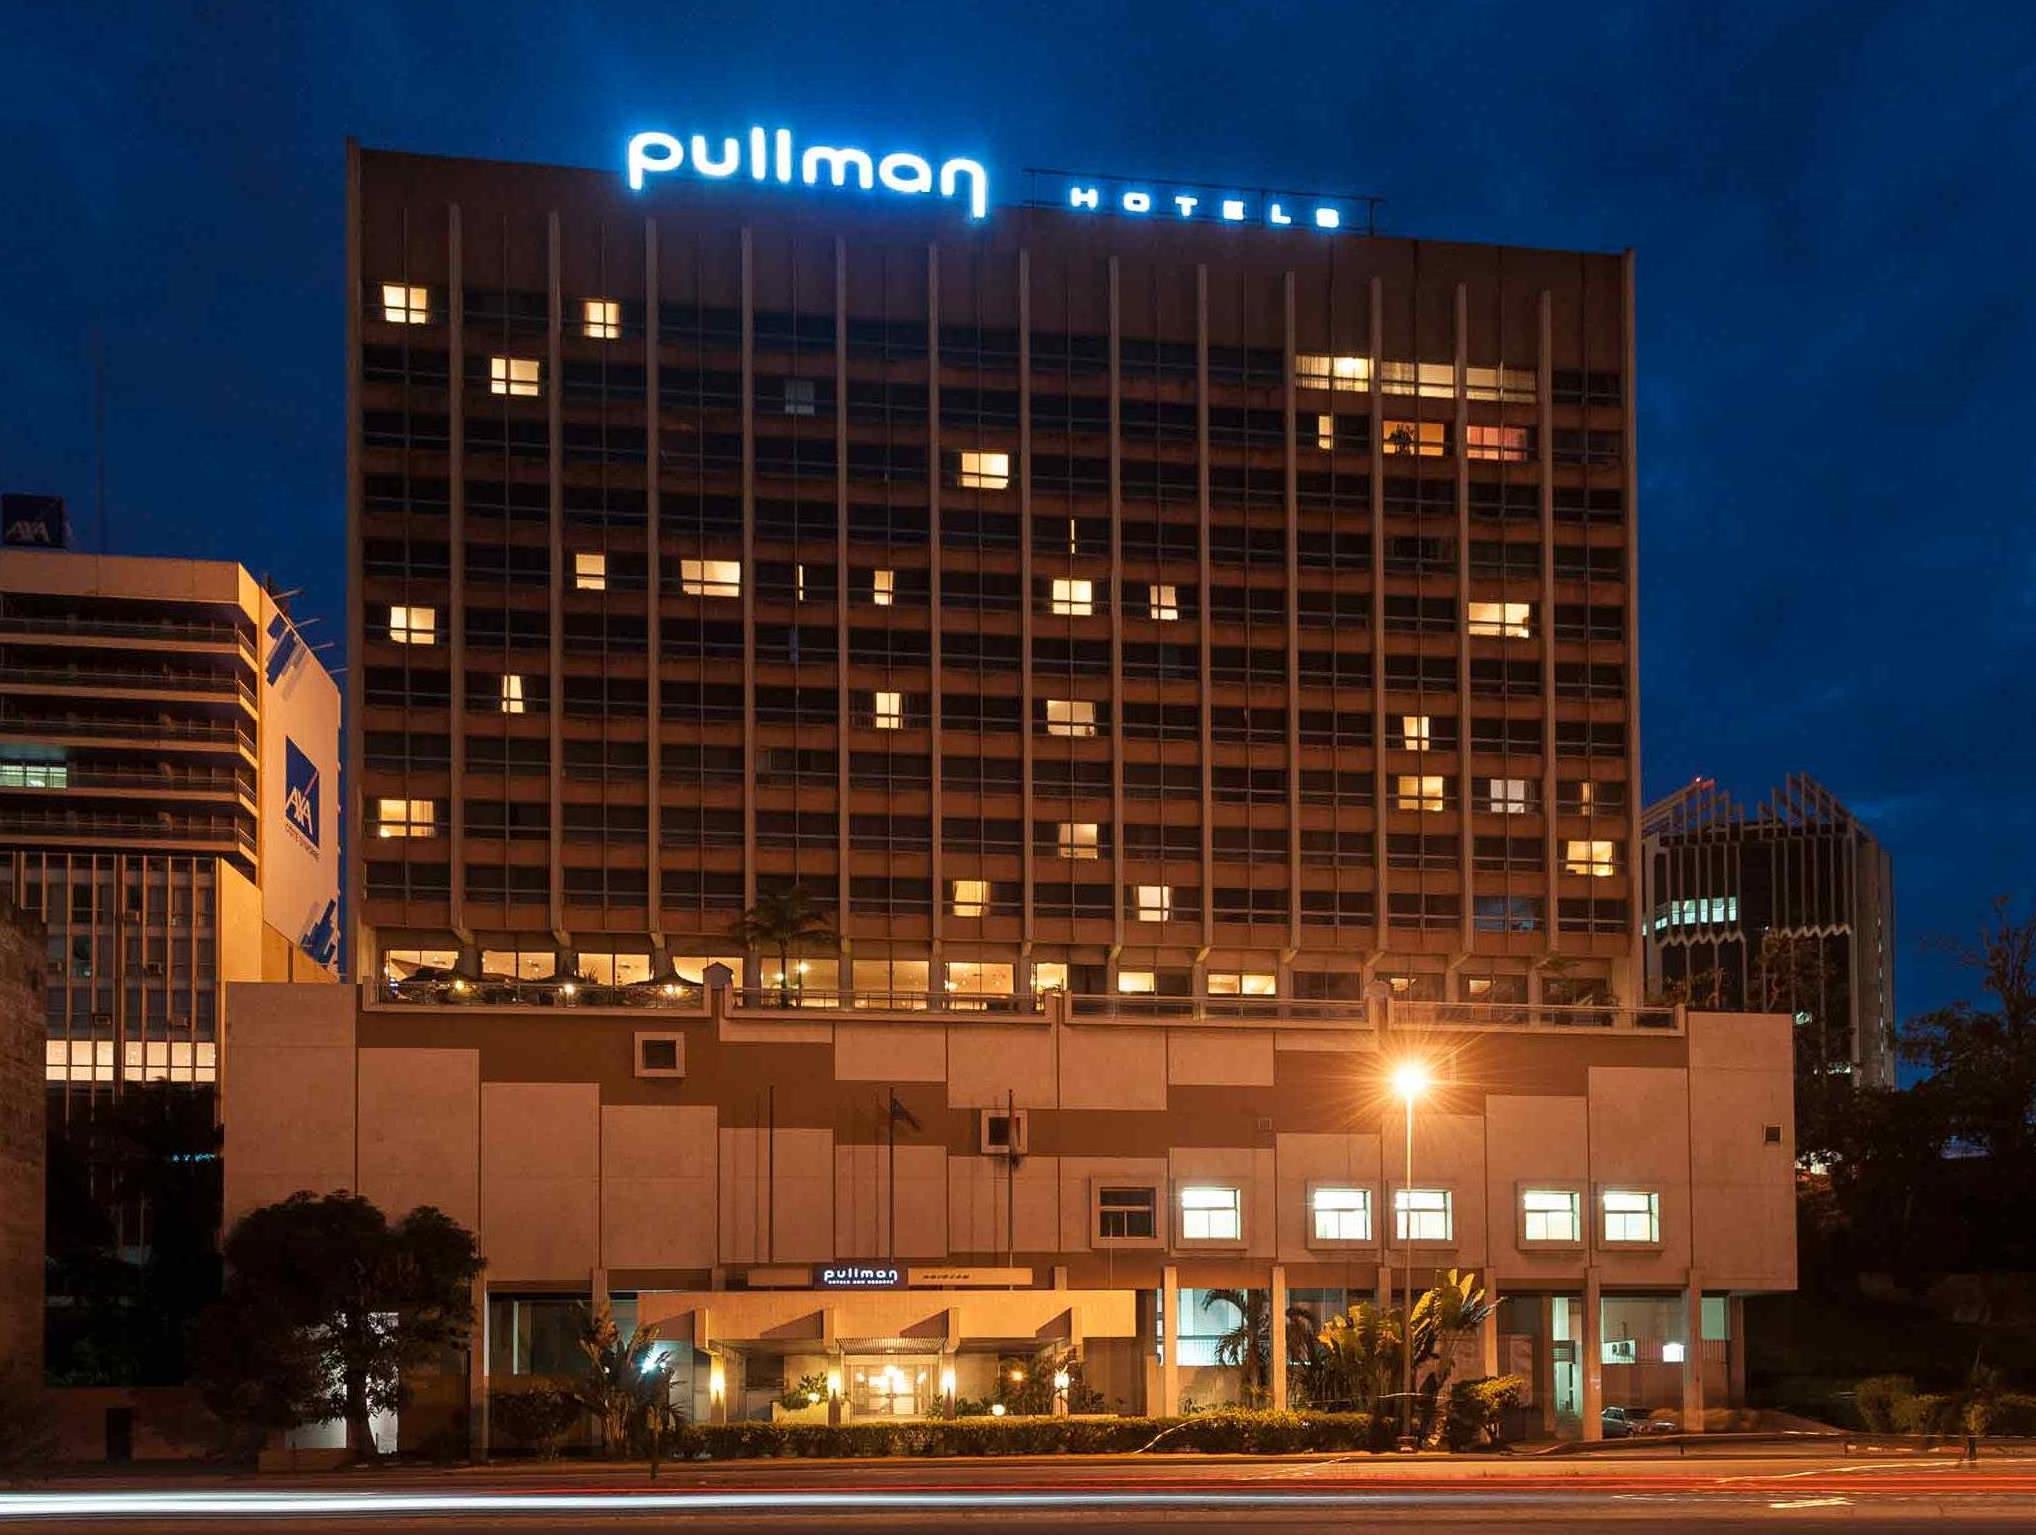 Hotel Pullman Abidjan